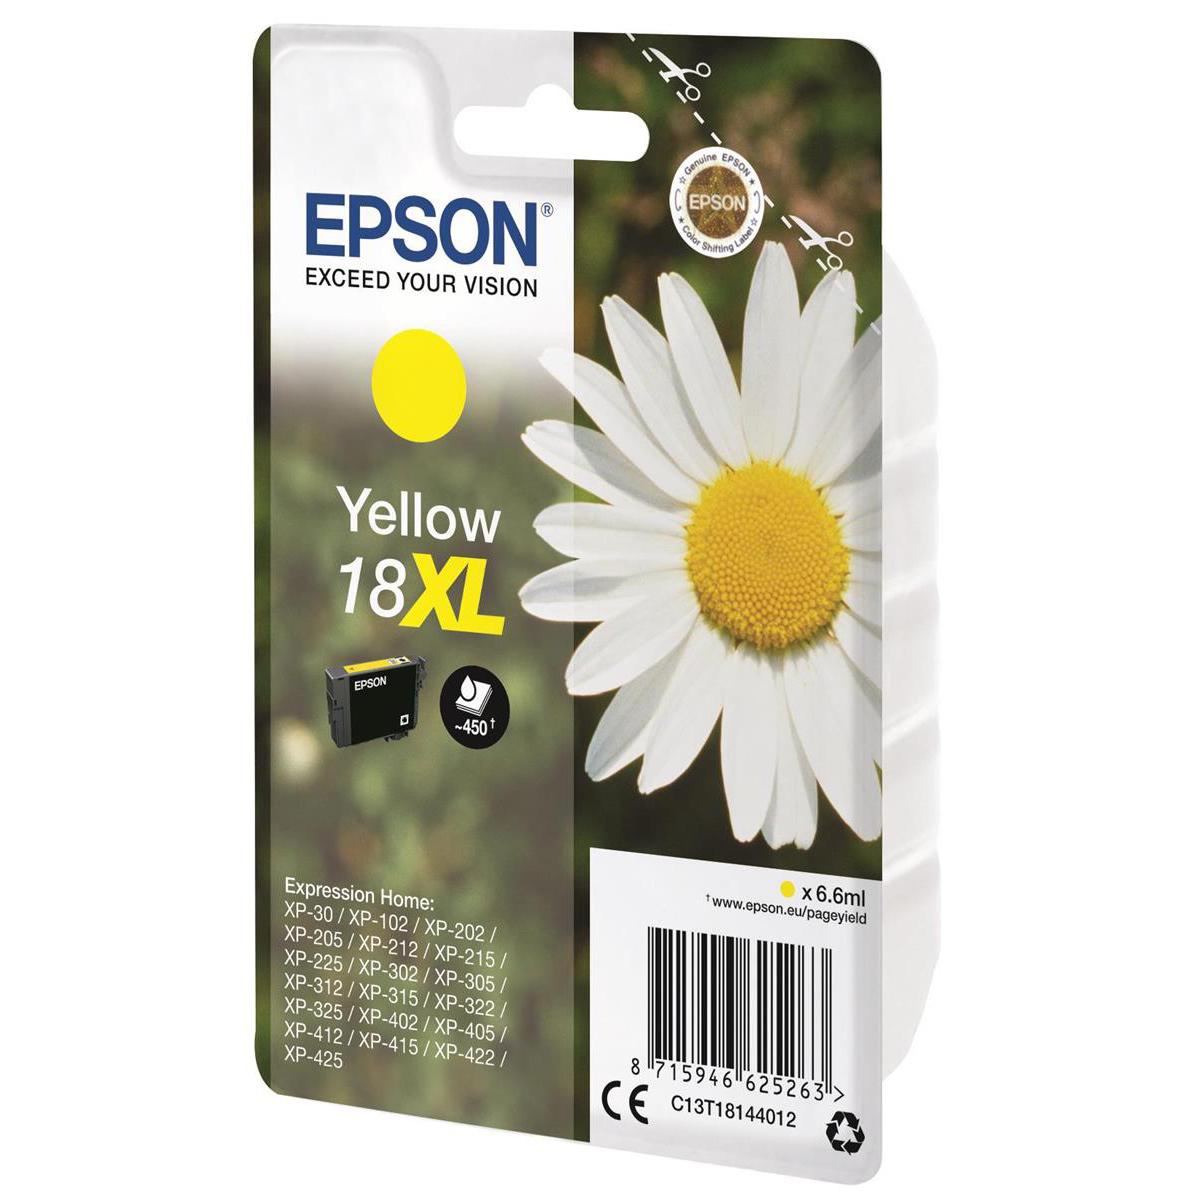 Epson 18XL Inkjet Cartridge Daisy High Yield Page Life 450pp 6.6ml Yellow Ref C13T18144012